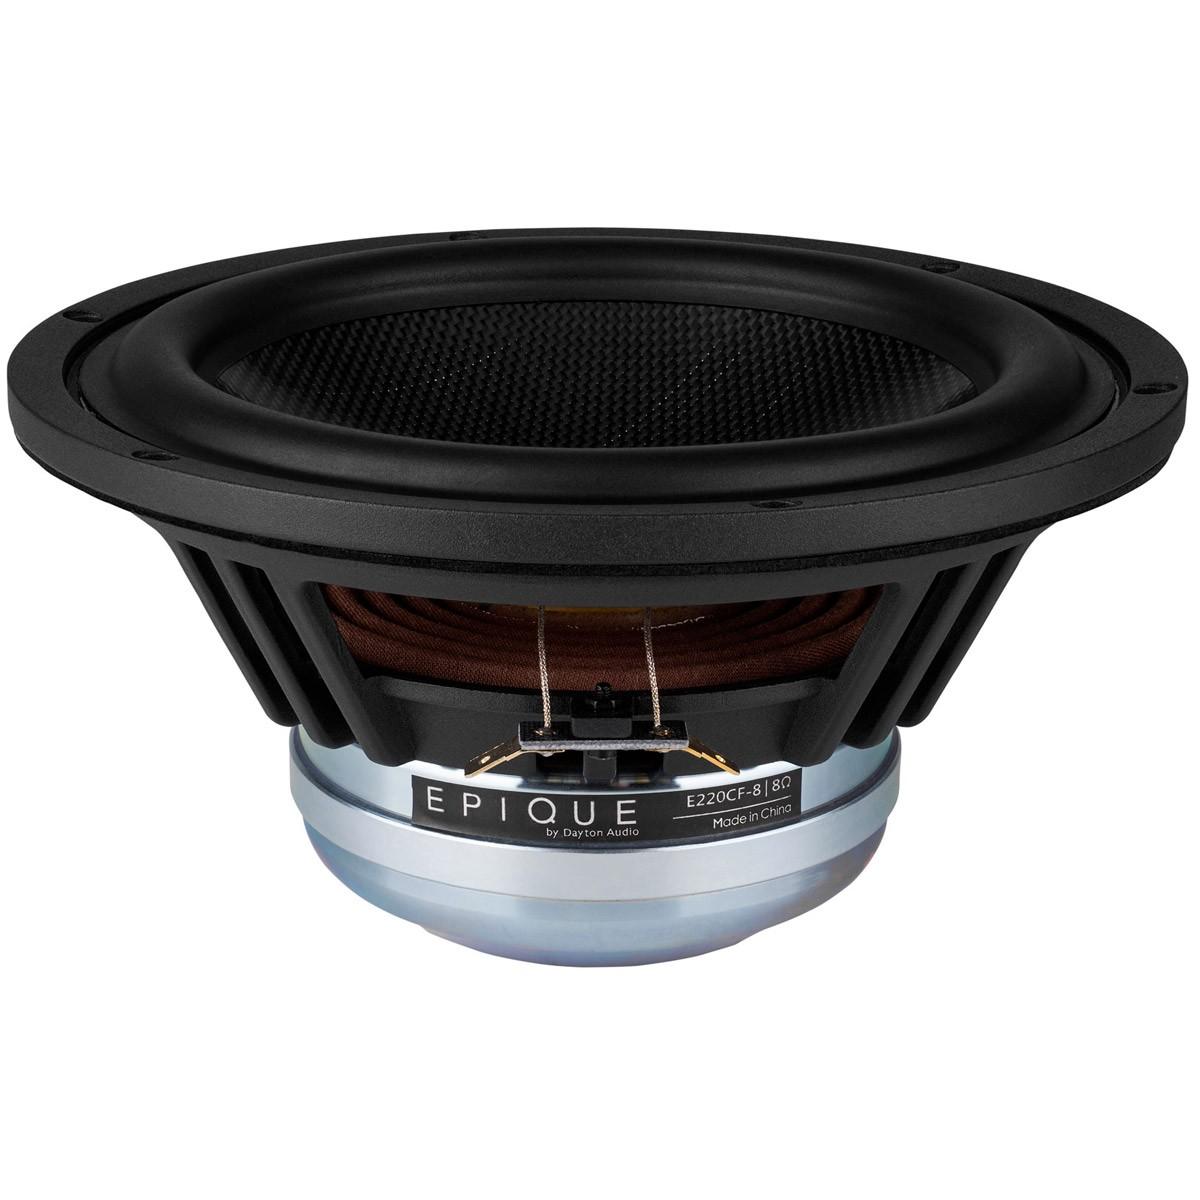 DAYTON AUDIO EPIQUE E220CF-8 Speaker Driver Woofer Carbon Fiber 150W 8 Ohm 91dB 25Hz - 4500Hz Ø20.3cm